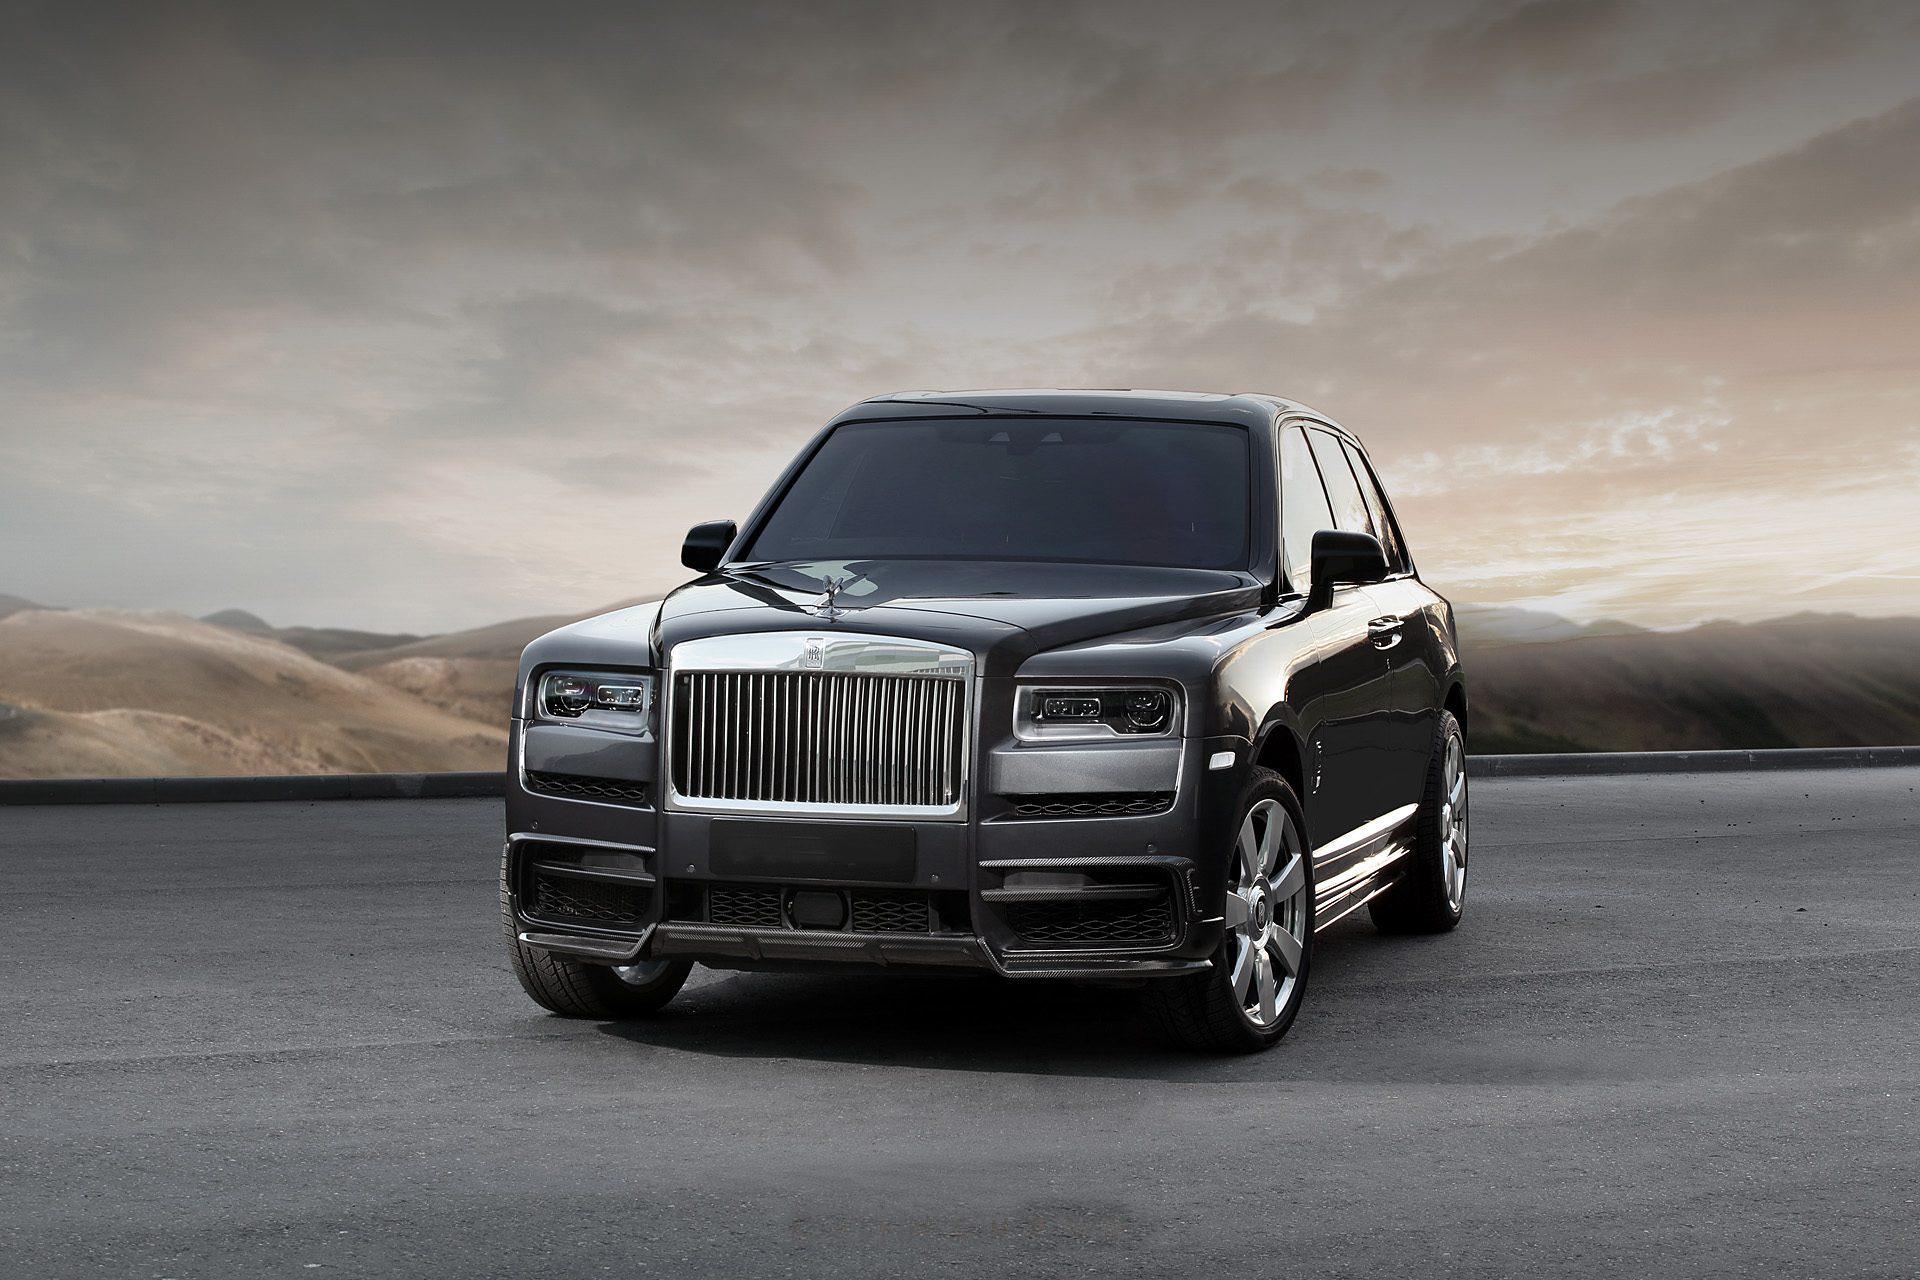 Hodoor Performance Carbon fiber Air Intake Splitter Cover for Rolls Royce